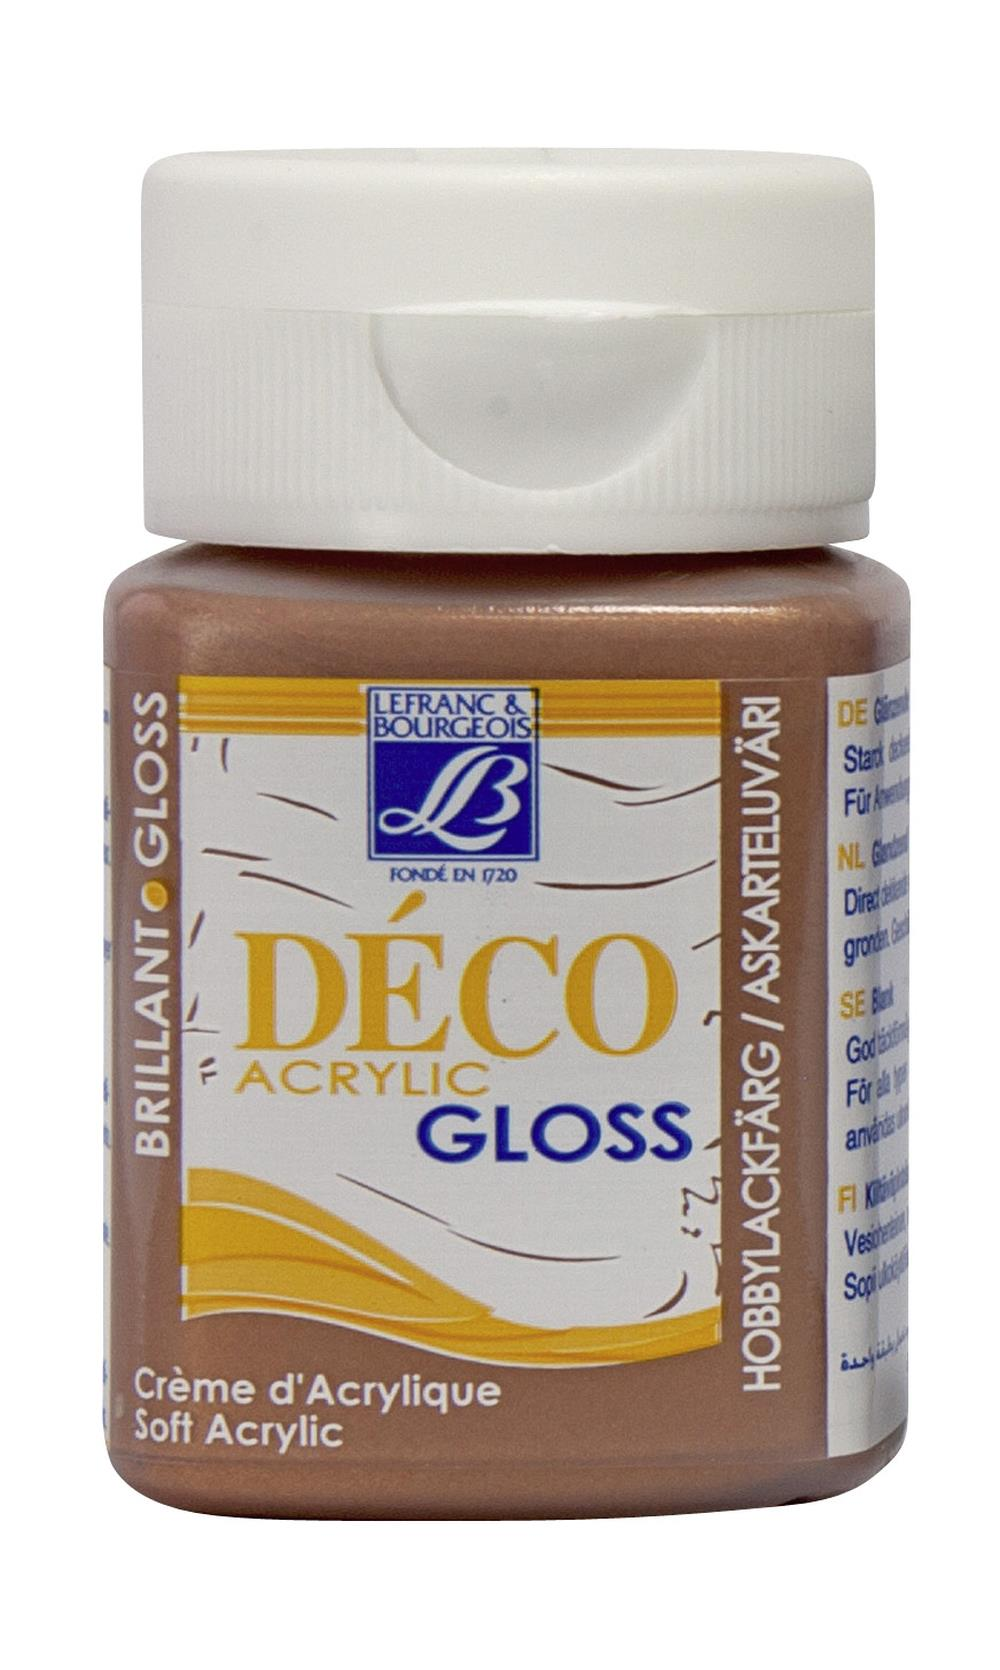 Hobbyfärg L&B Deco Gloss Akryl 50ml Copper 707 (4F) Utgår